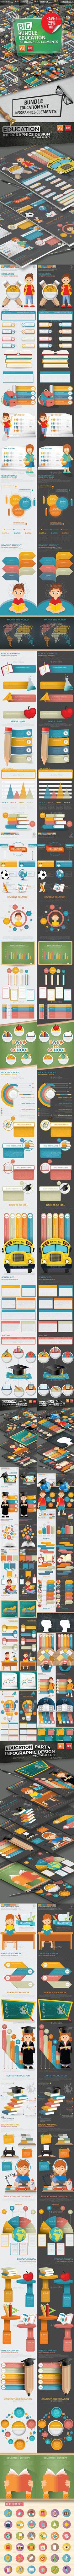 Bundle Education Infographics — Vector EPS #icon #school • Download ➝ https://graphicriver.net/item/bundle-education-infographics/19988171?ref=rabosch